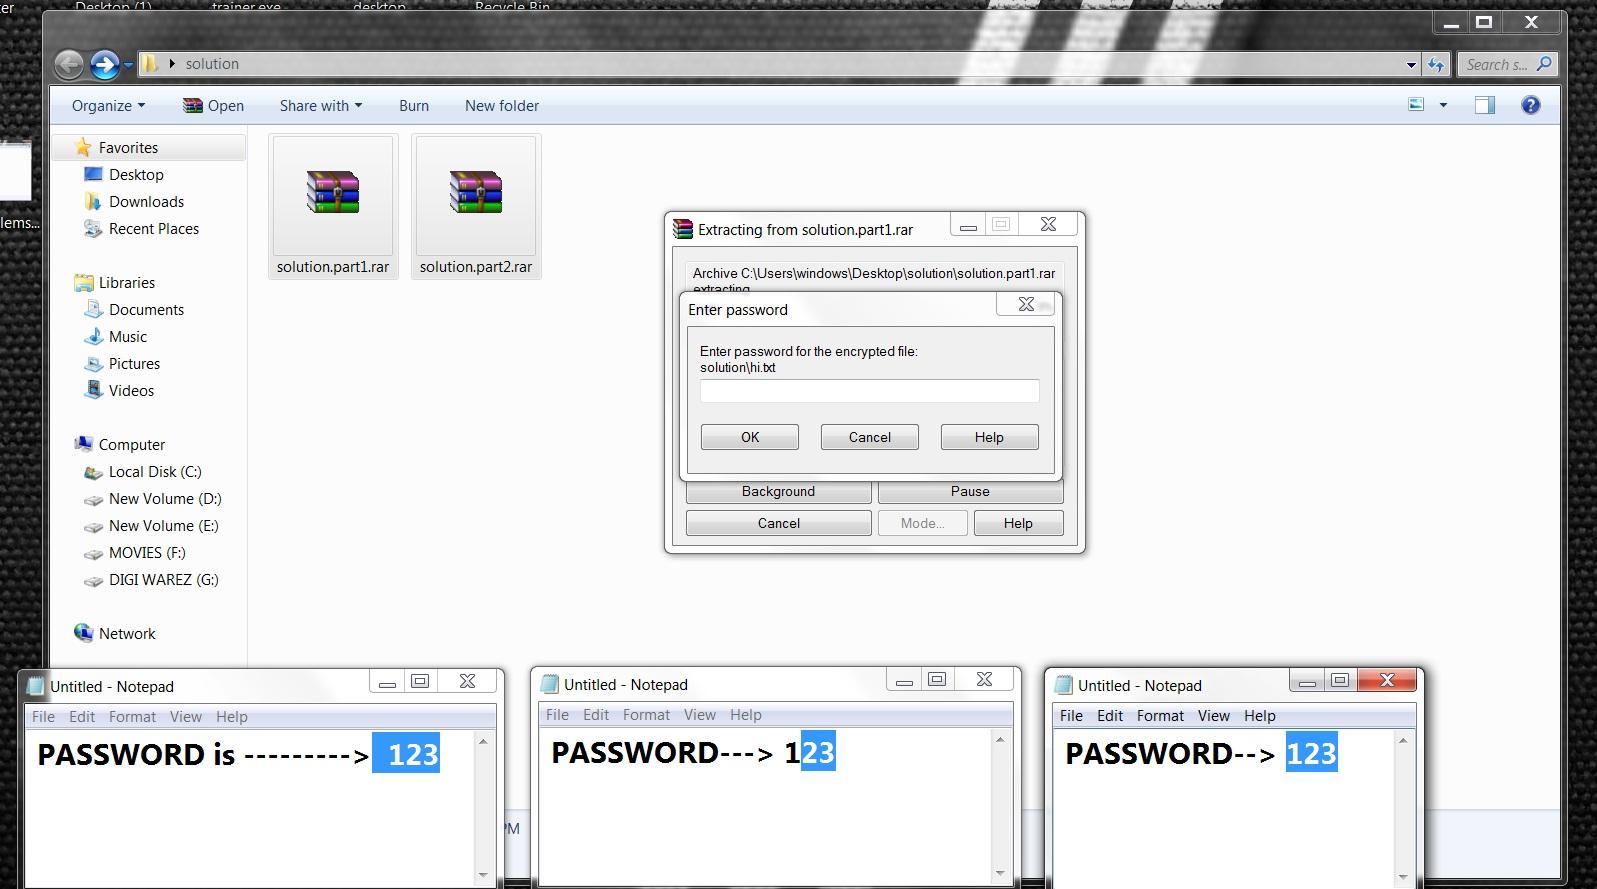 winrar for windows 7 32 bit